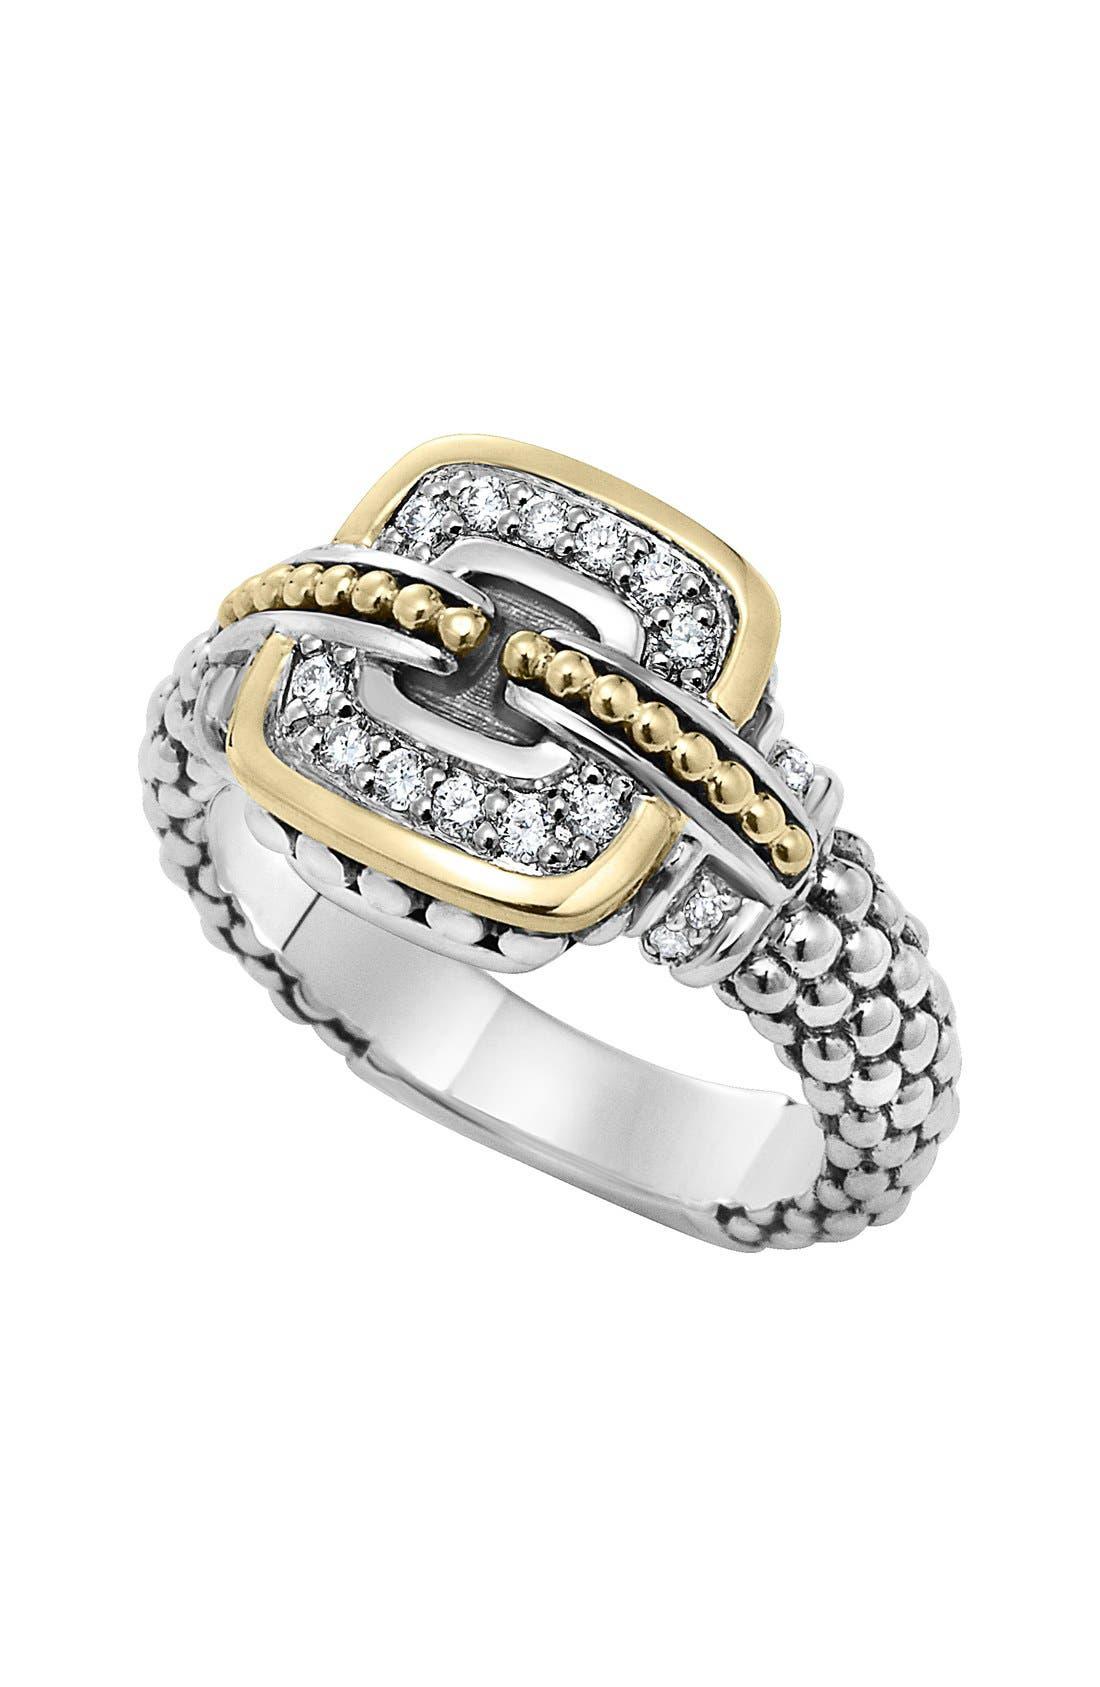 Alternate Image 1 Selected - LAGOS 'Cushion' Small Diamond Ring